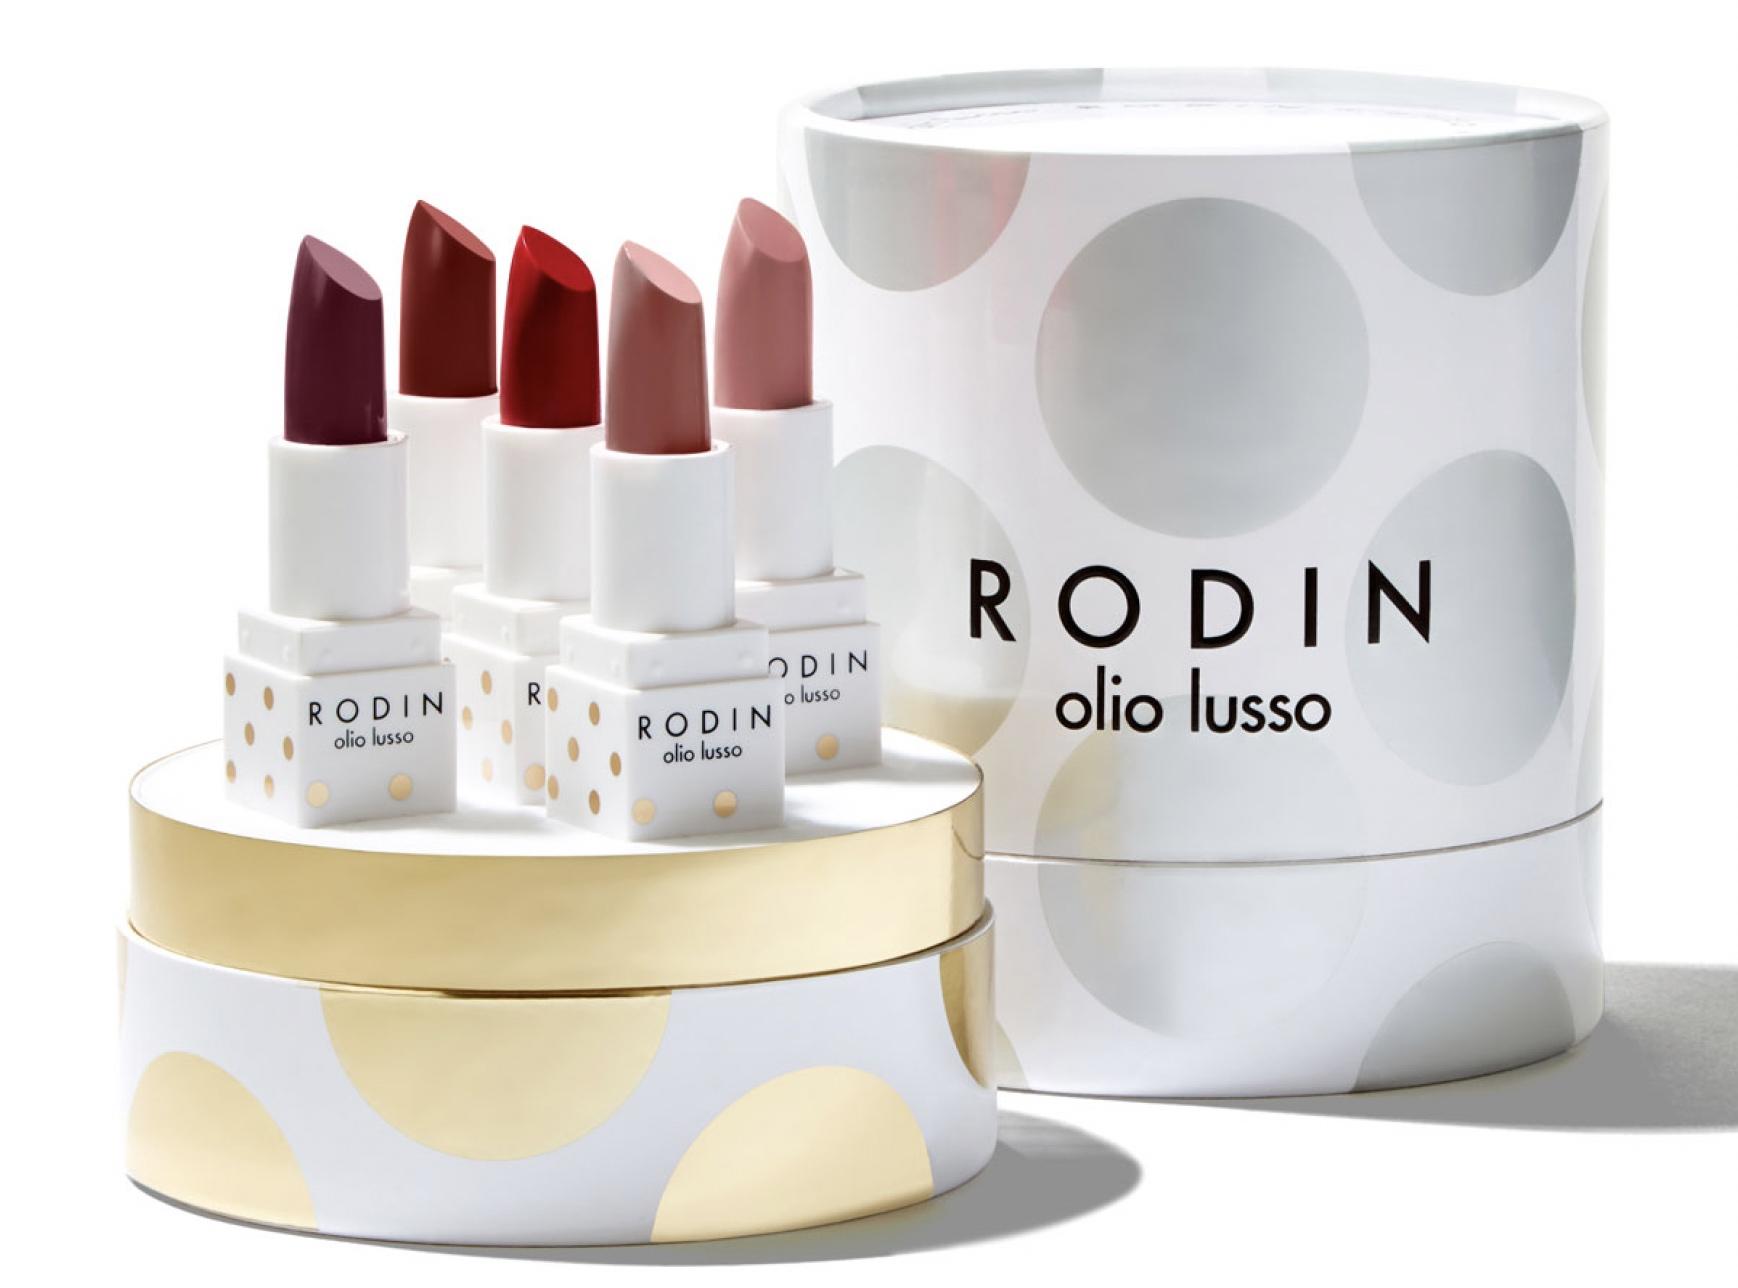 RODIN_LIPSTICKS.jpg